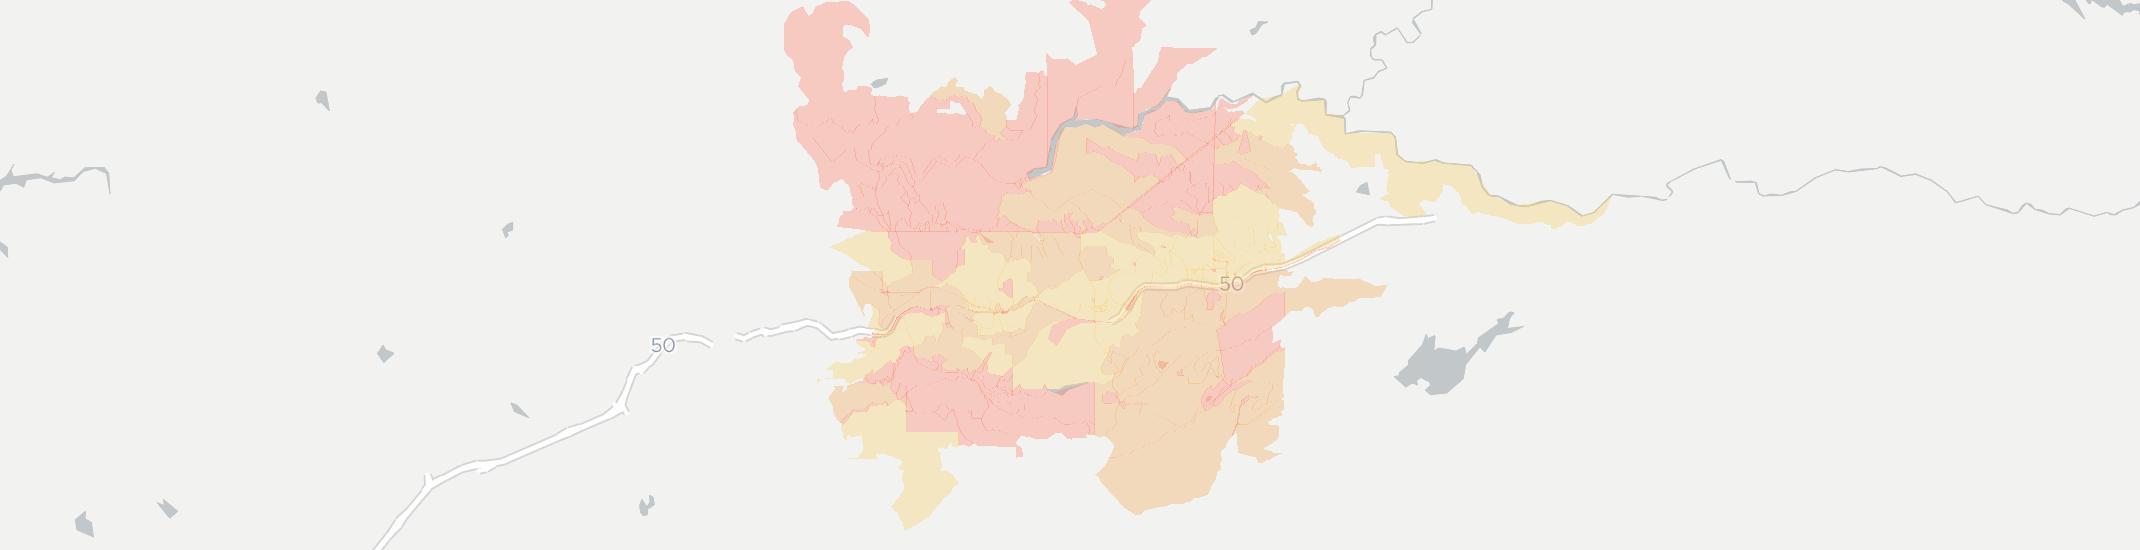 Camino California Map on